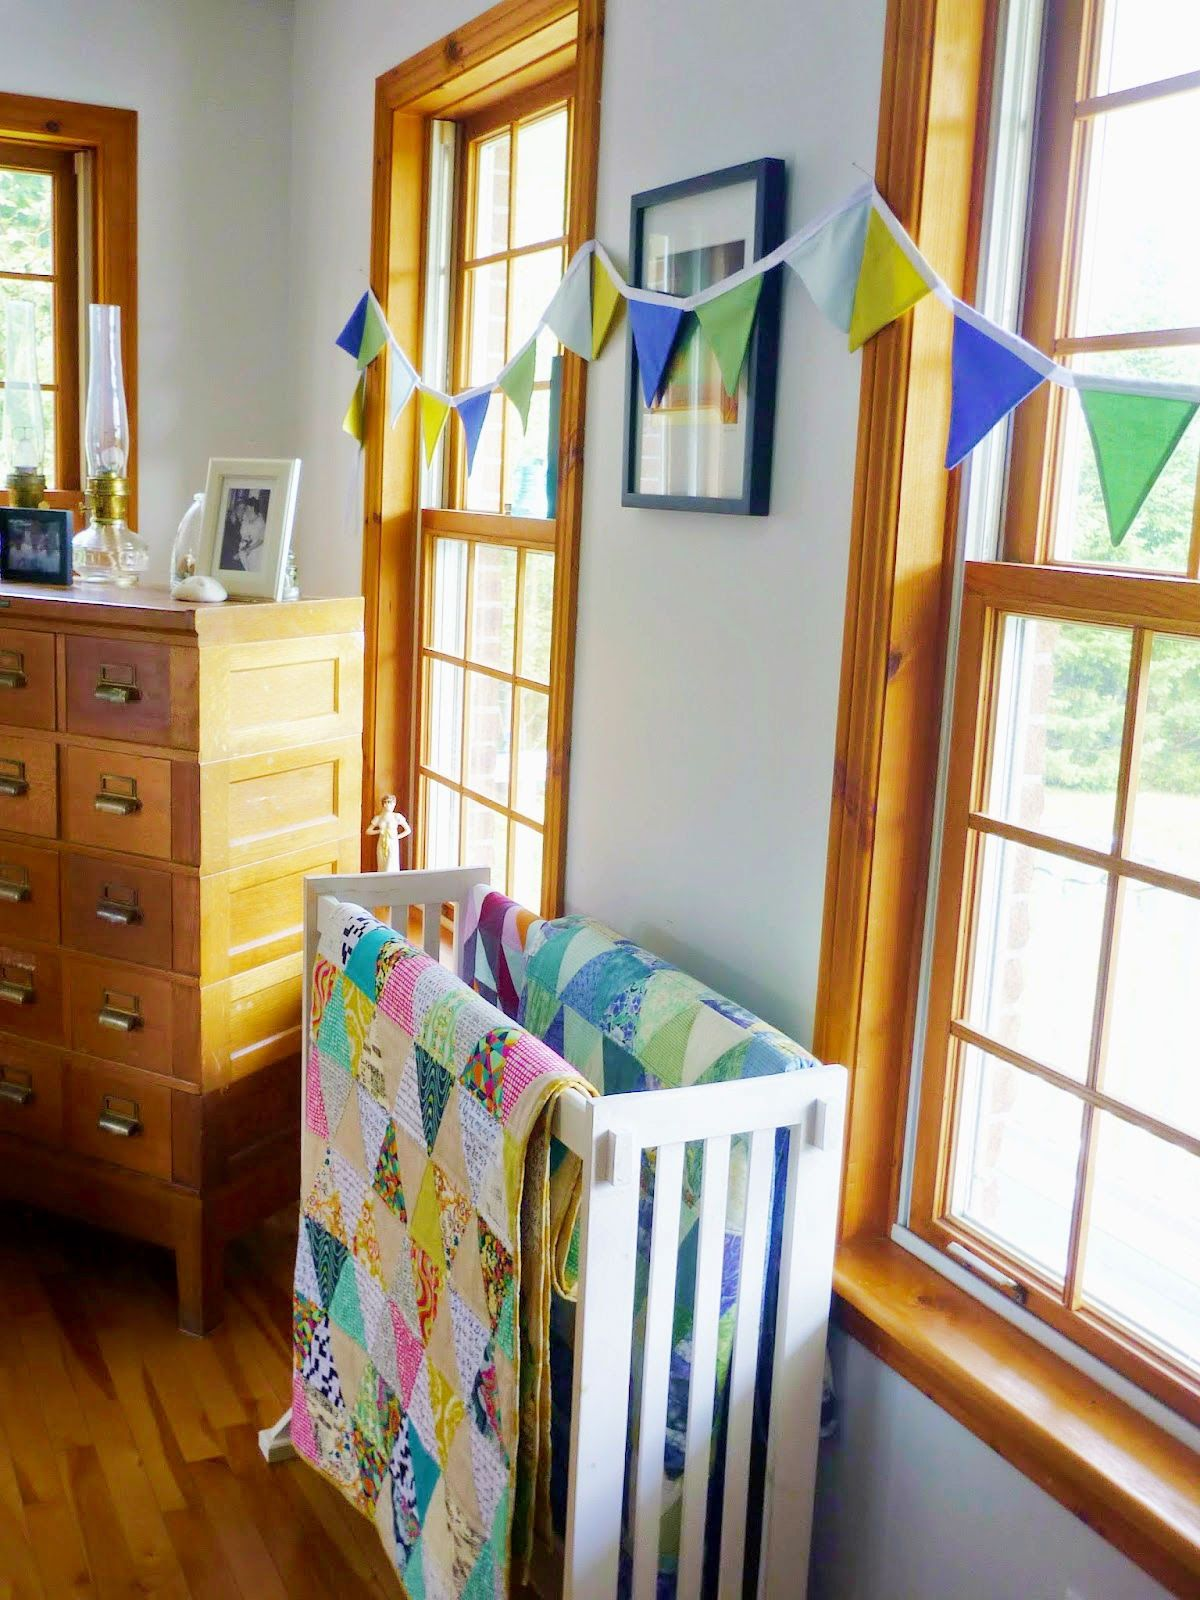 Sew Sisters Quilt Shop: Kona Club Challenge - Flag Bunting by ... : sew sisters quilt shop - Adamdwight.com